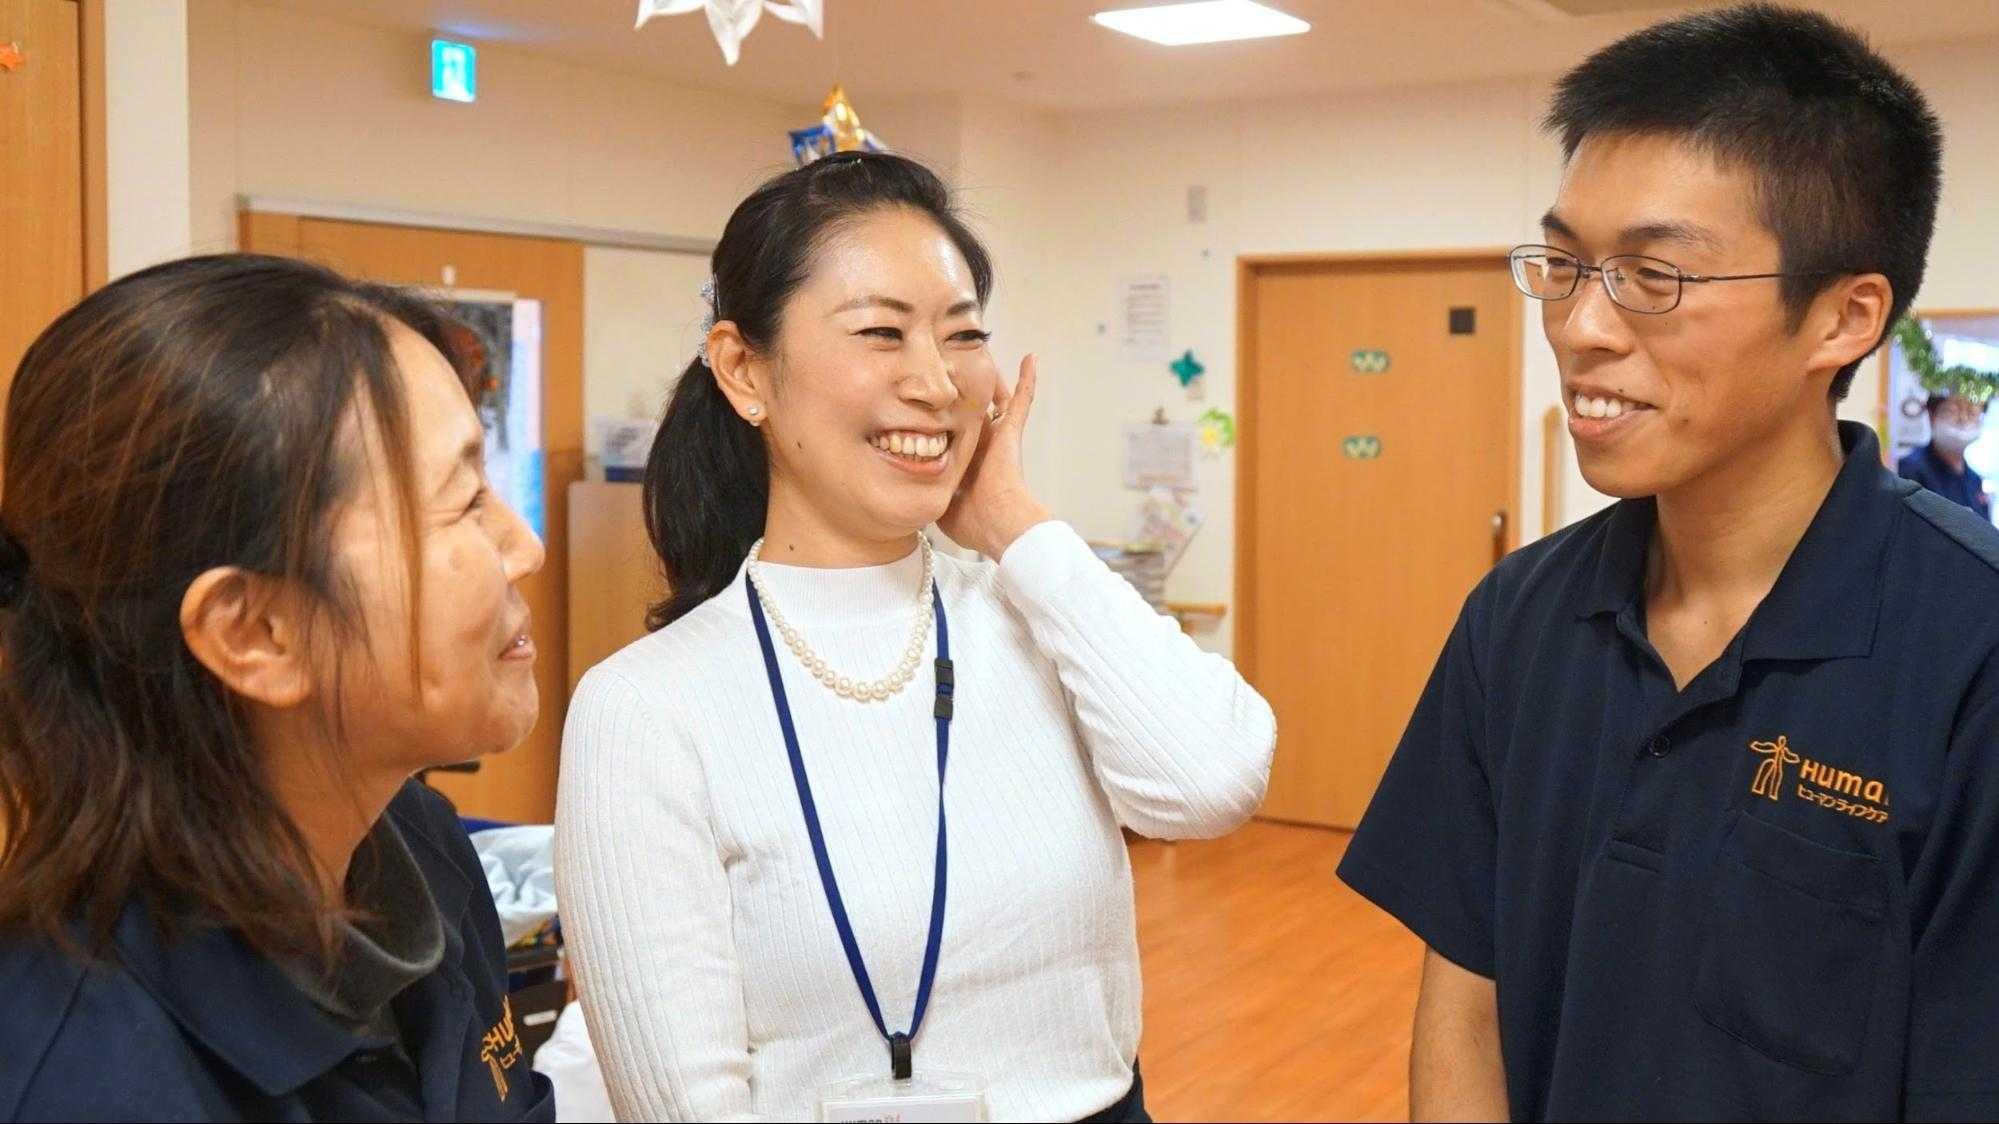 [PR] ヒューマンライフケアは介護経験者こそ輝けるー現場スタッフ・管理職が語る会社の魅力